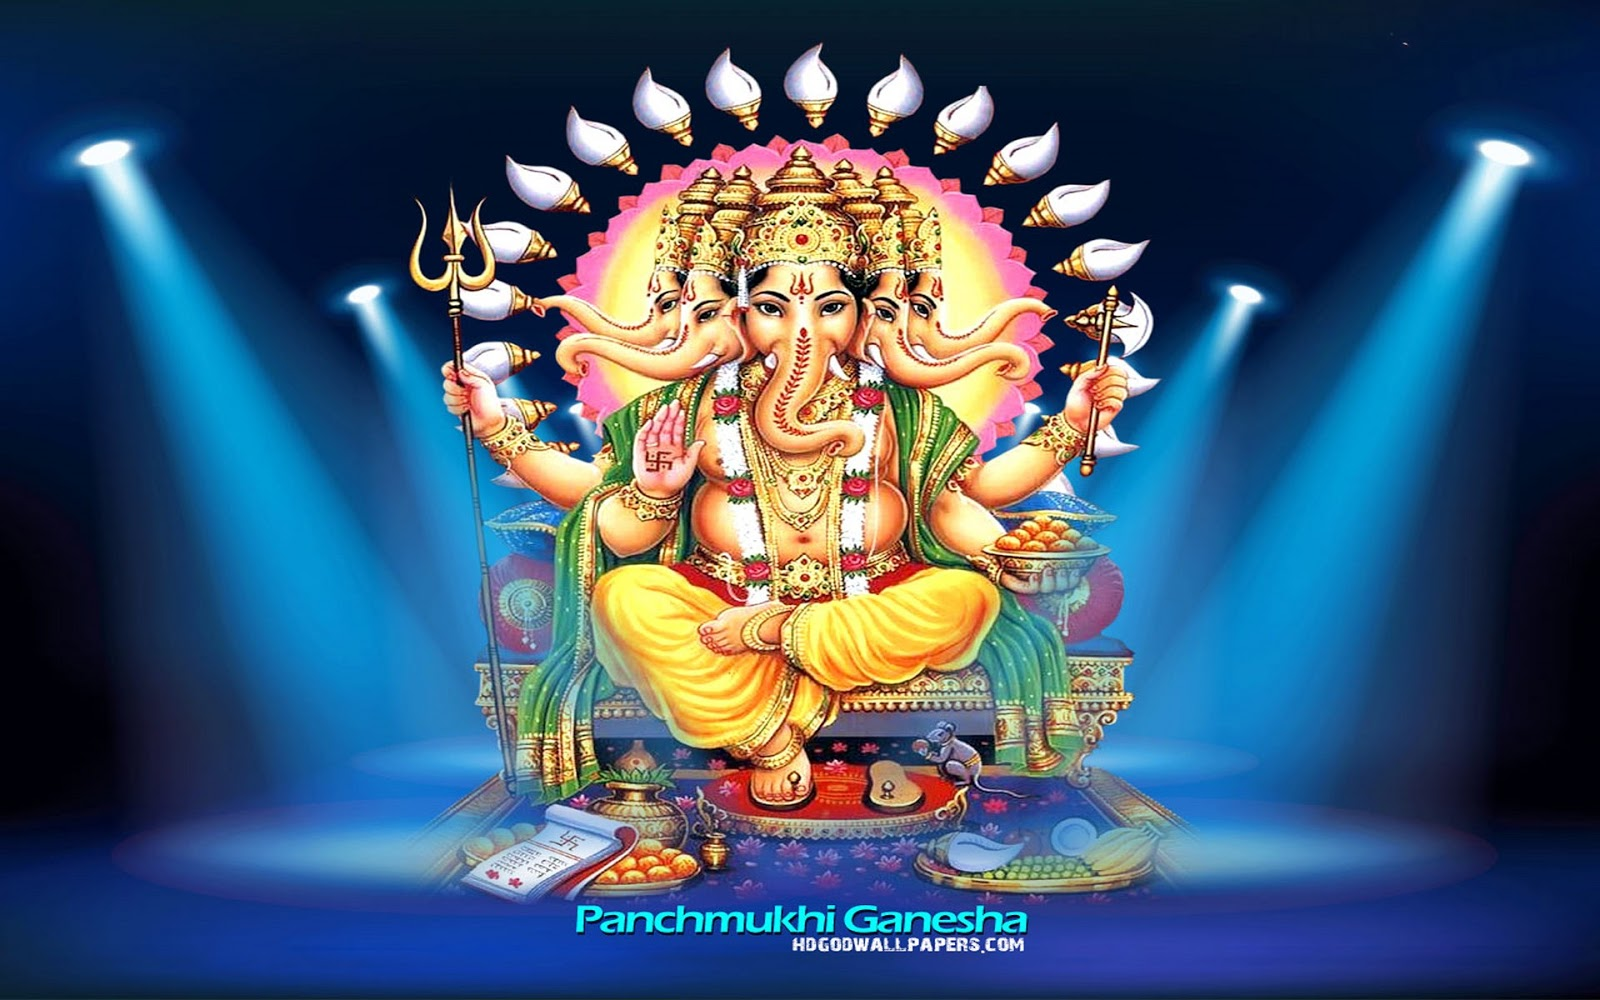 Panchmukhi Ganesh Images of God